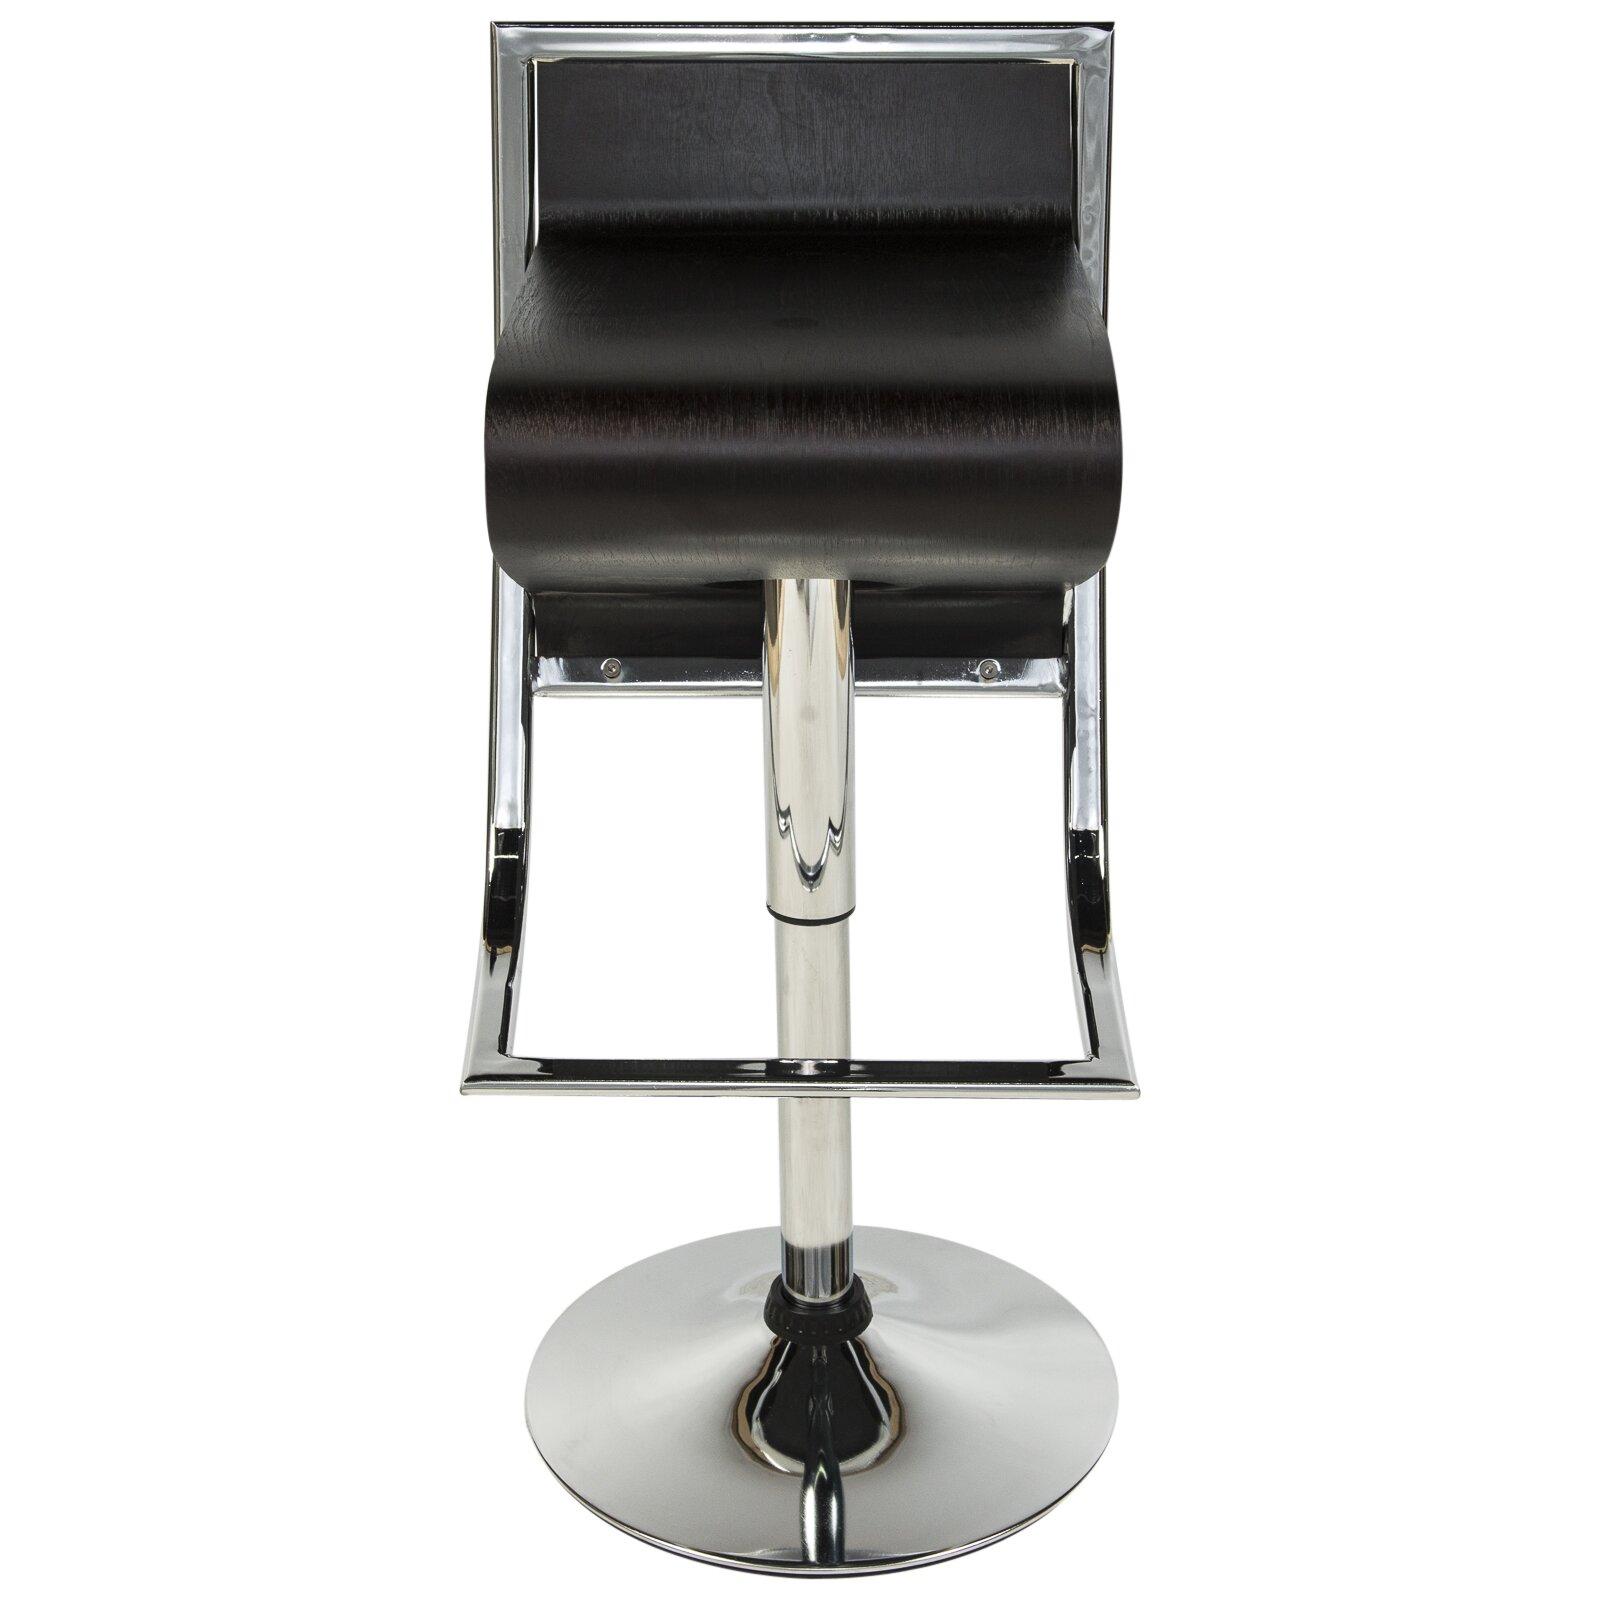 Leisuremod napoli adjustable height swivel bar stool wayfair for Adjustable height bar stools